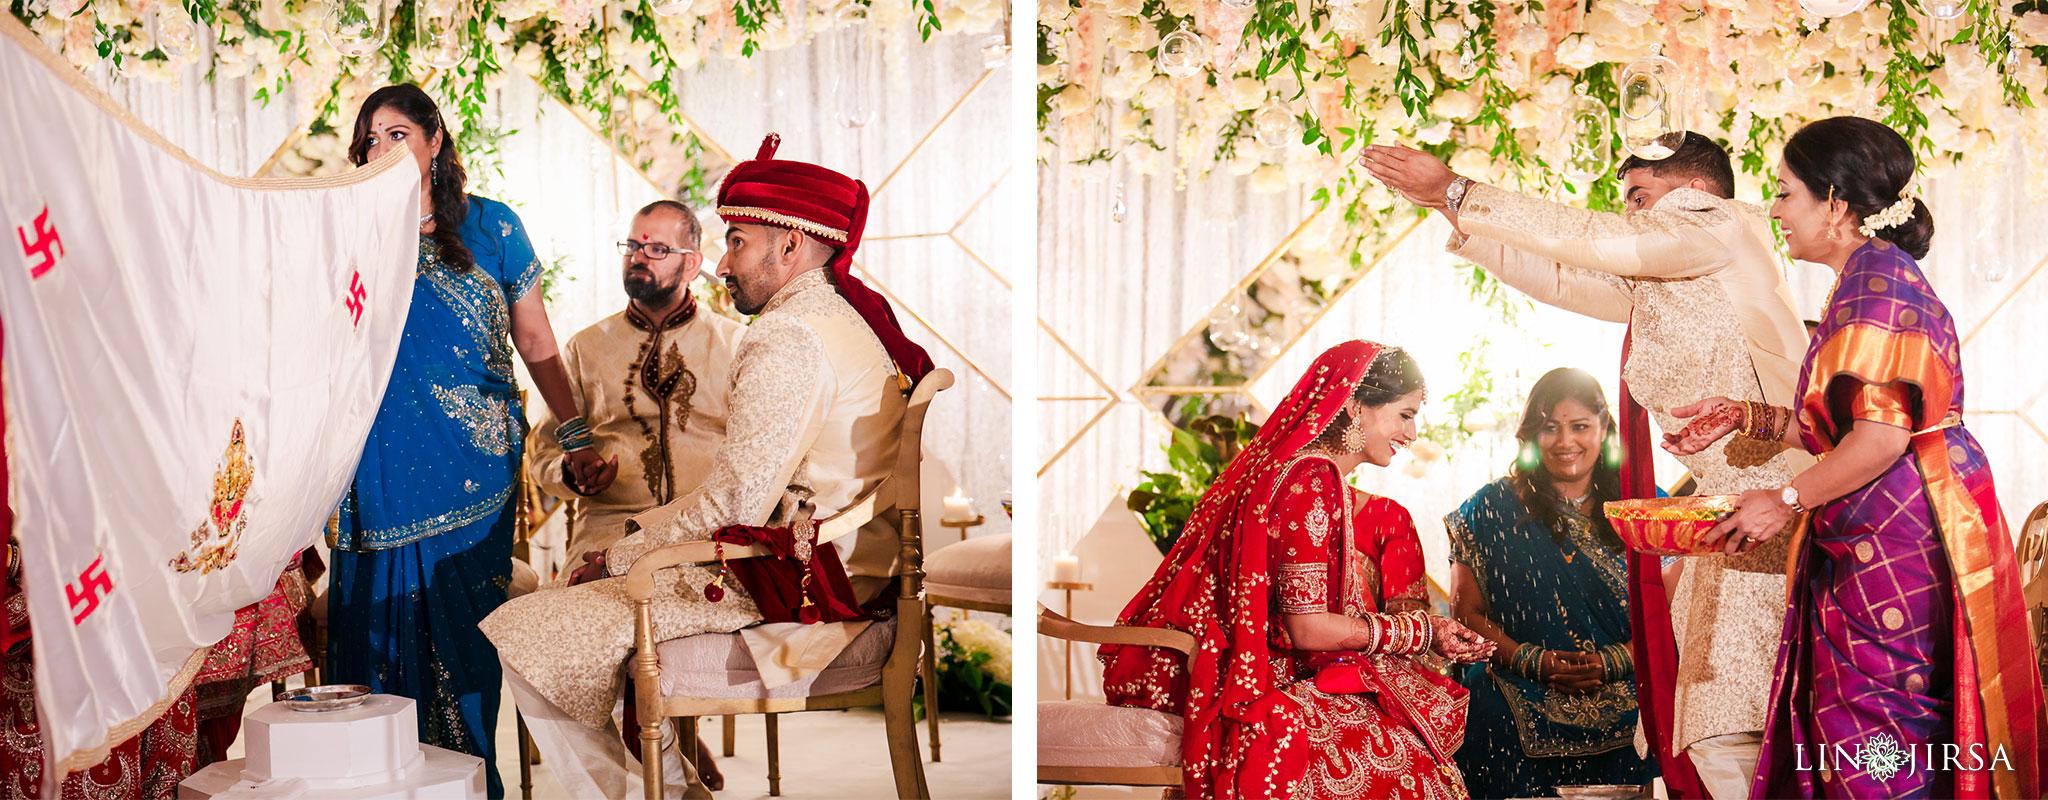 017 san jose marriott indian wedding photography